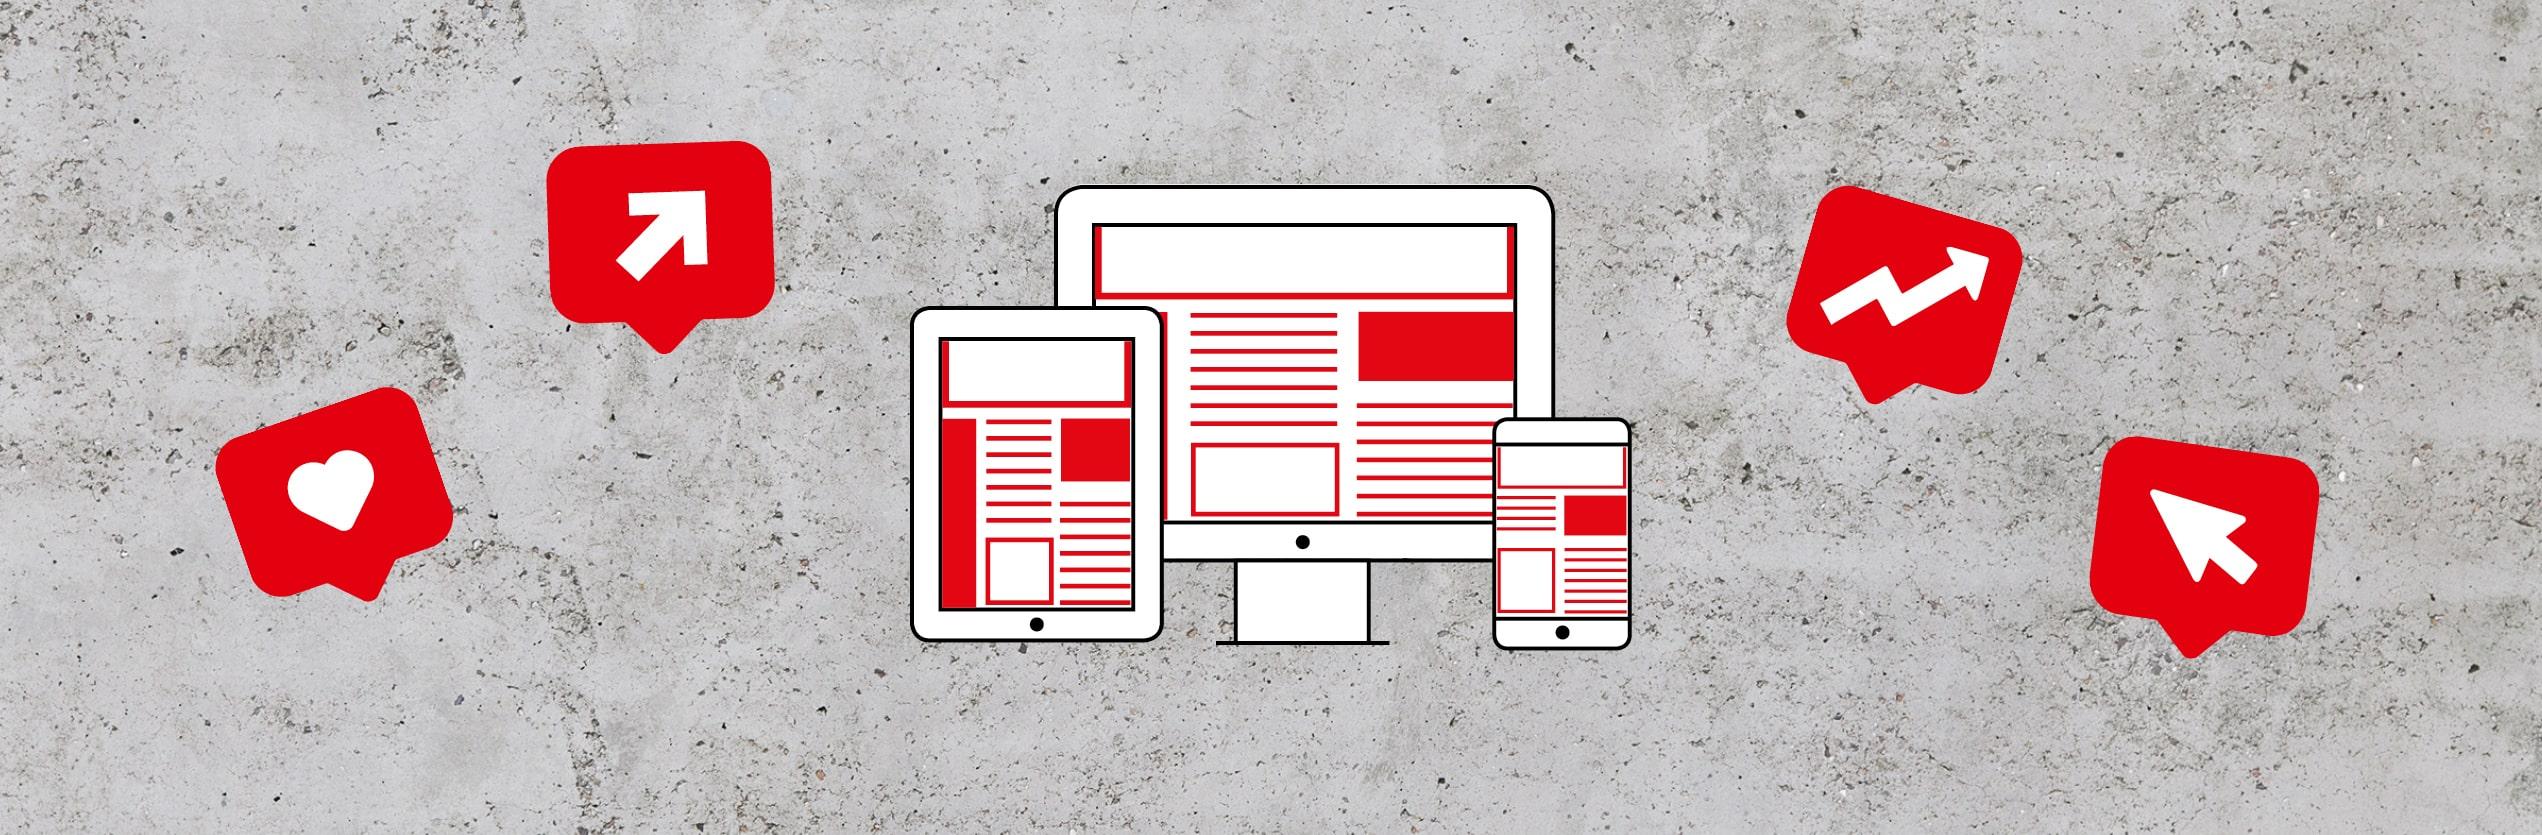 Blog Online Banner Icons